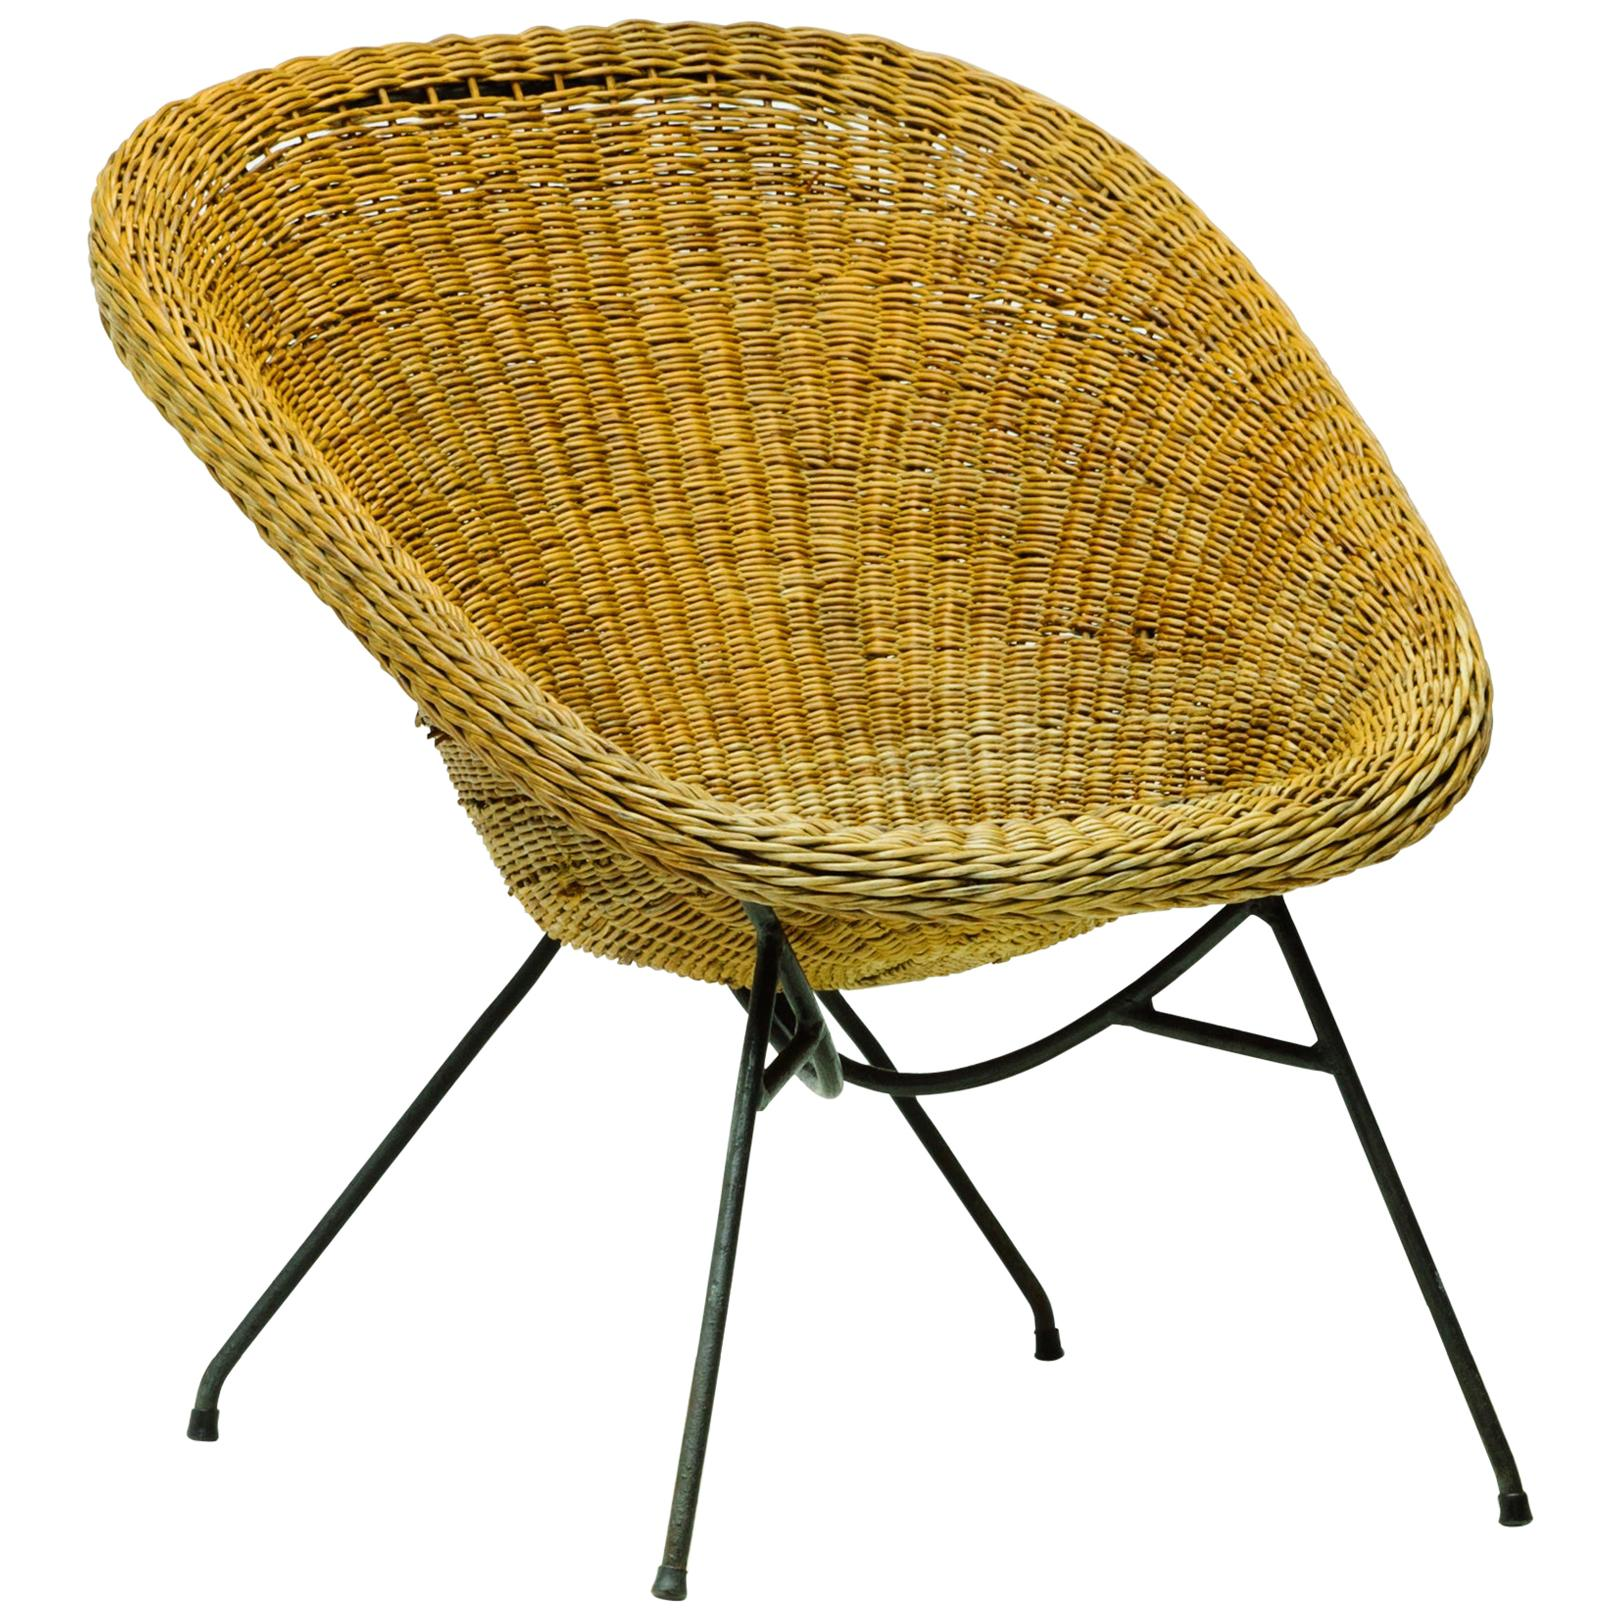 Wicker Armchair by Carlo Hauner and Martin Eisler, Brazilian Midcentury Design